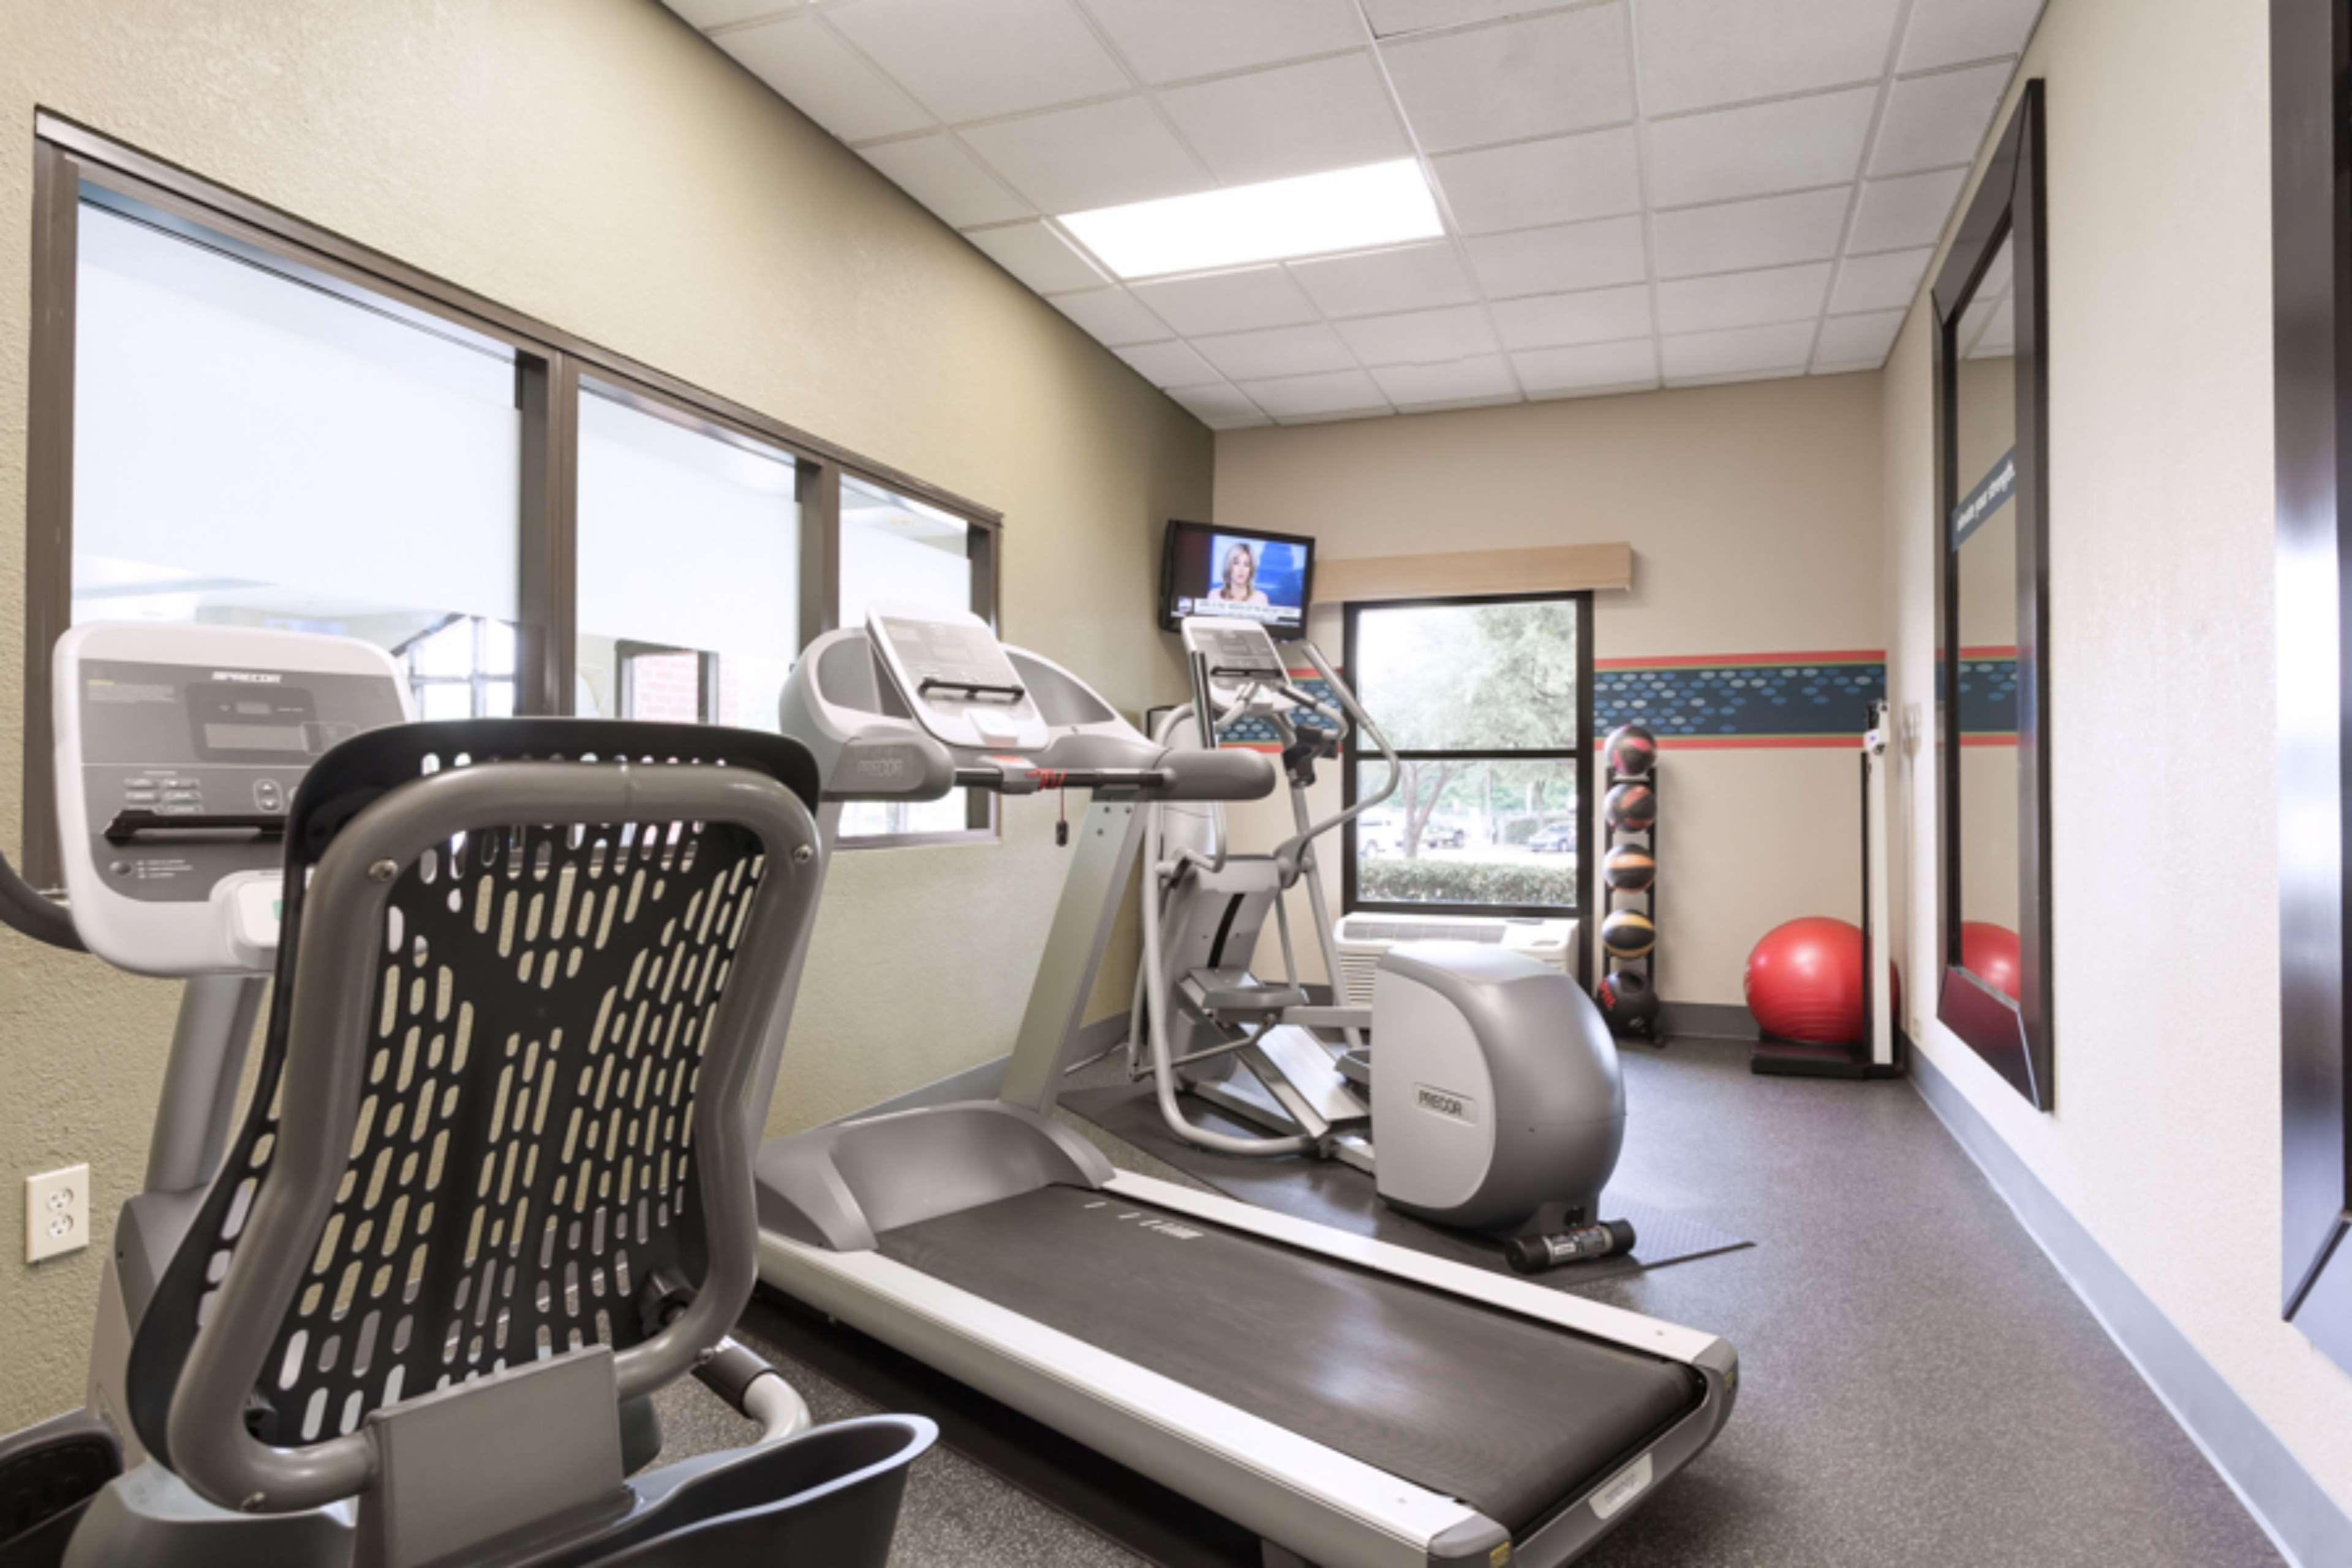 Hampton Inn & Suites Dallas-DFW Airport North-Grapevine image 11